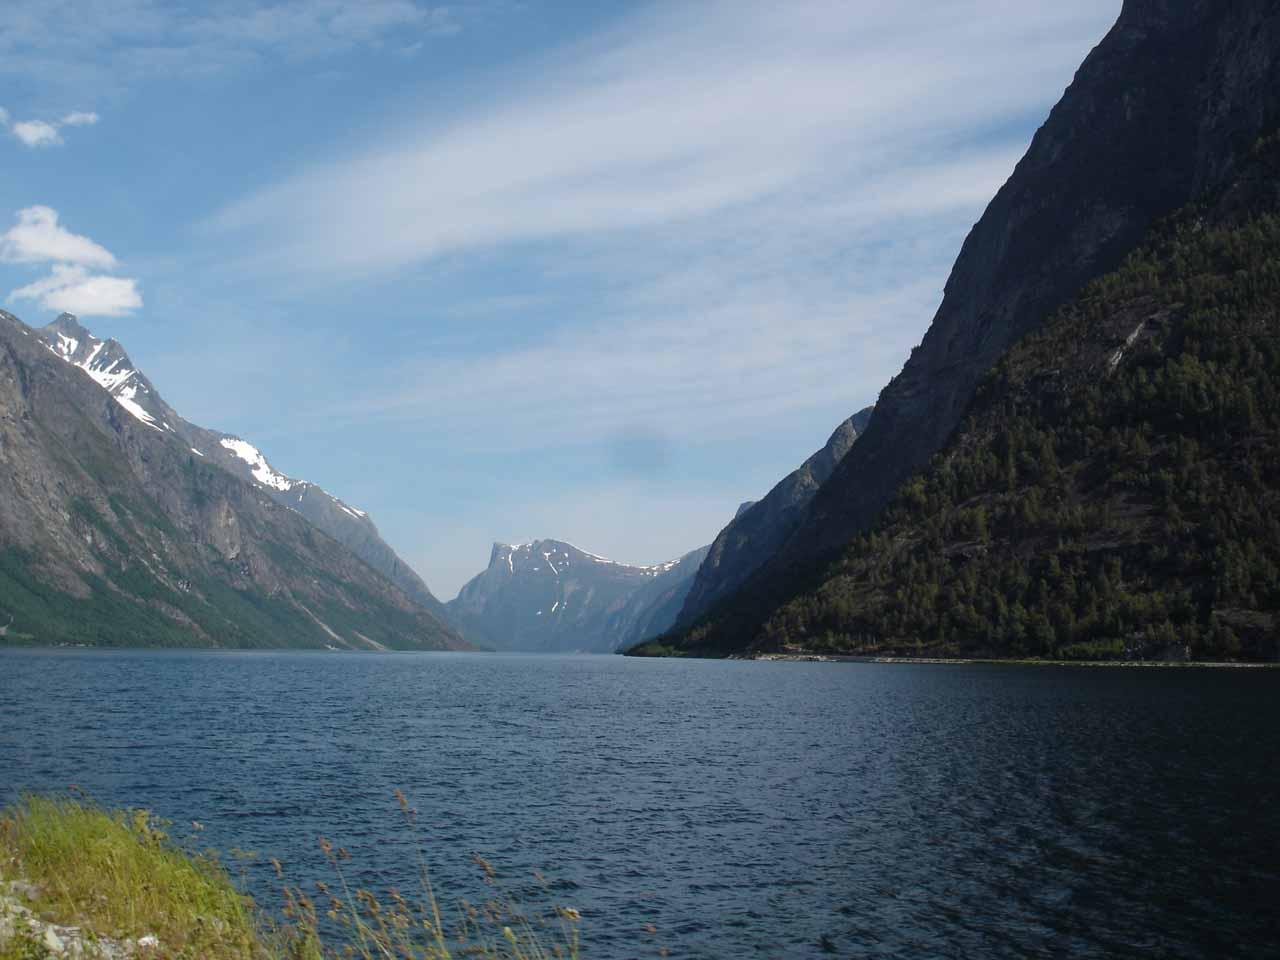 Looking towards the lake Eikesdalsvatnet on our way to Mardalsfossen